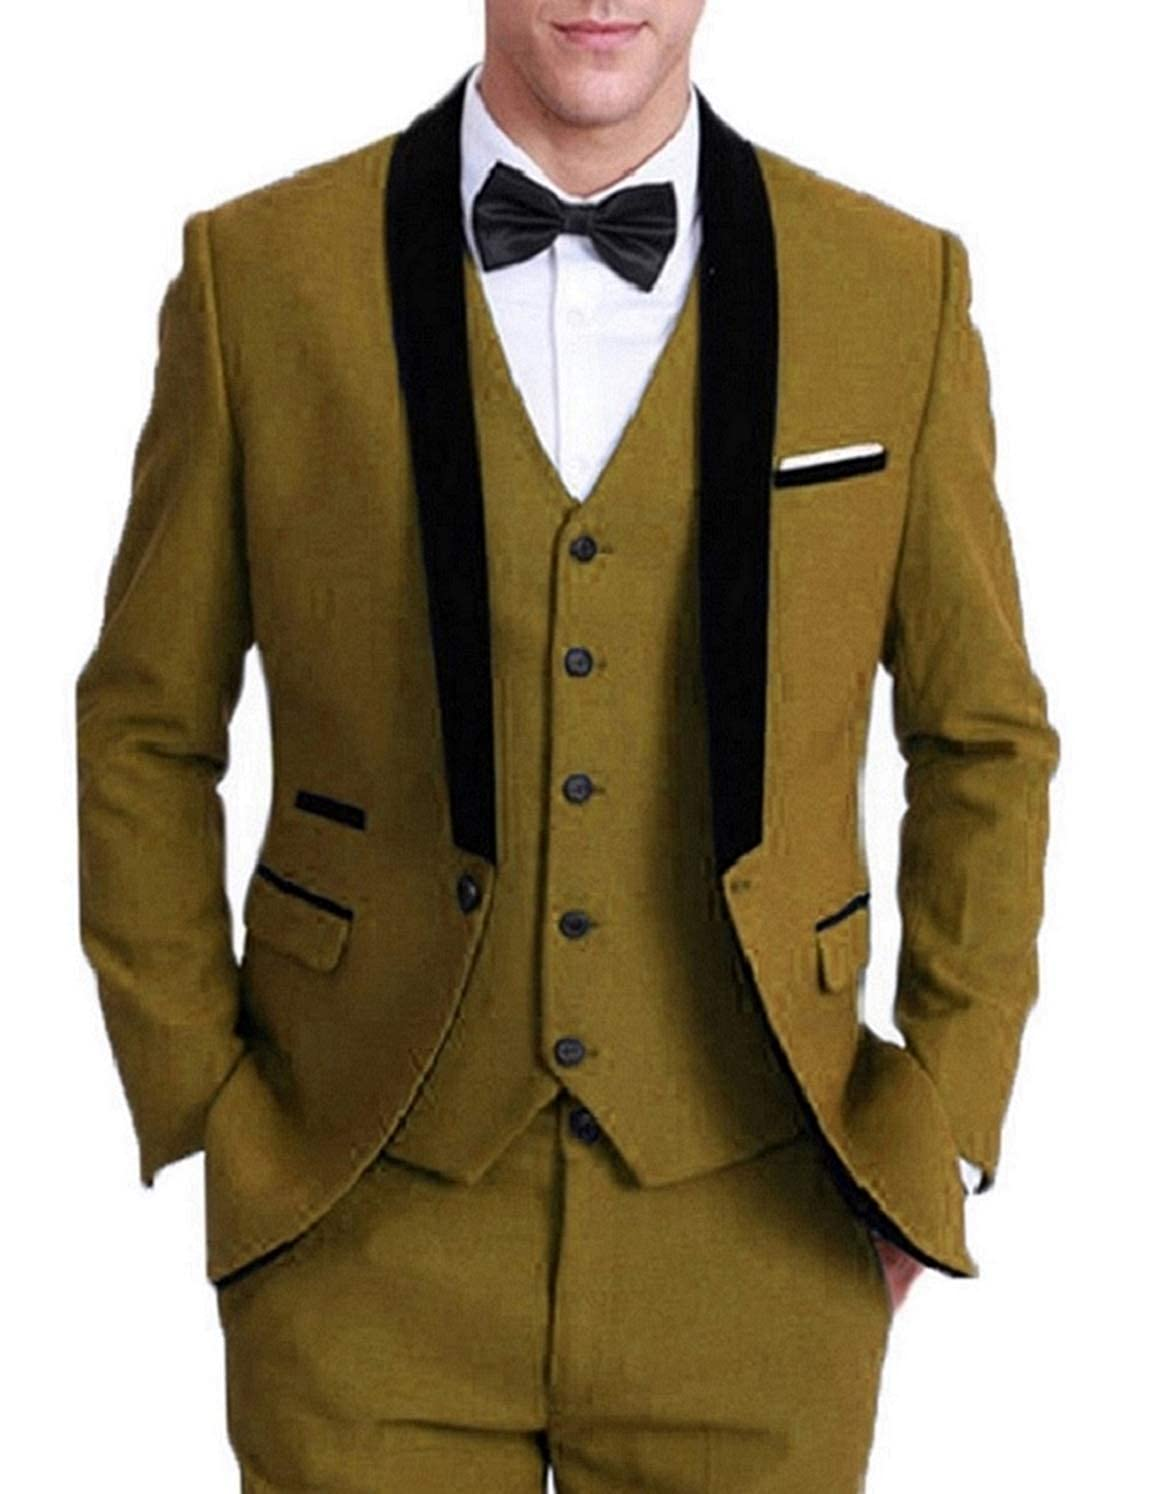 Amazon.com: Everbeauty - Trajes formales para hombre para ...